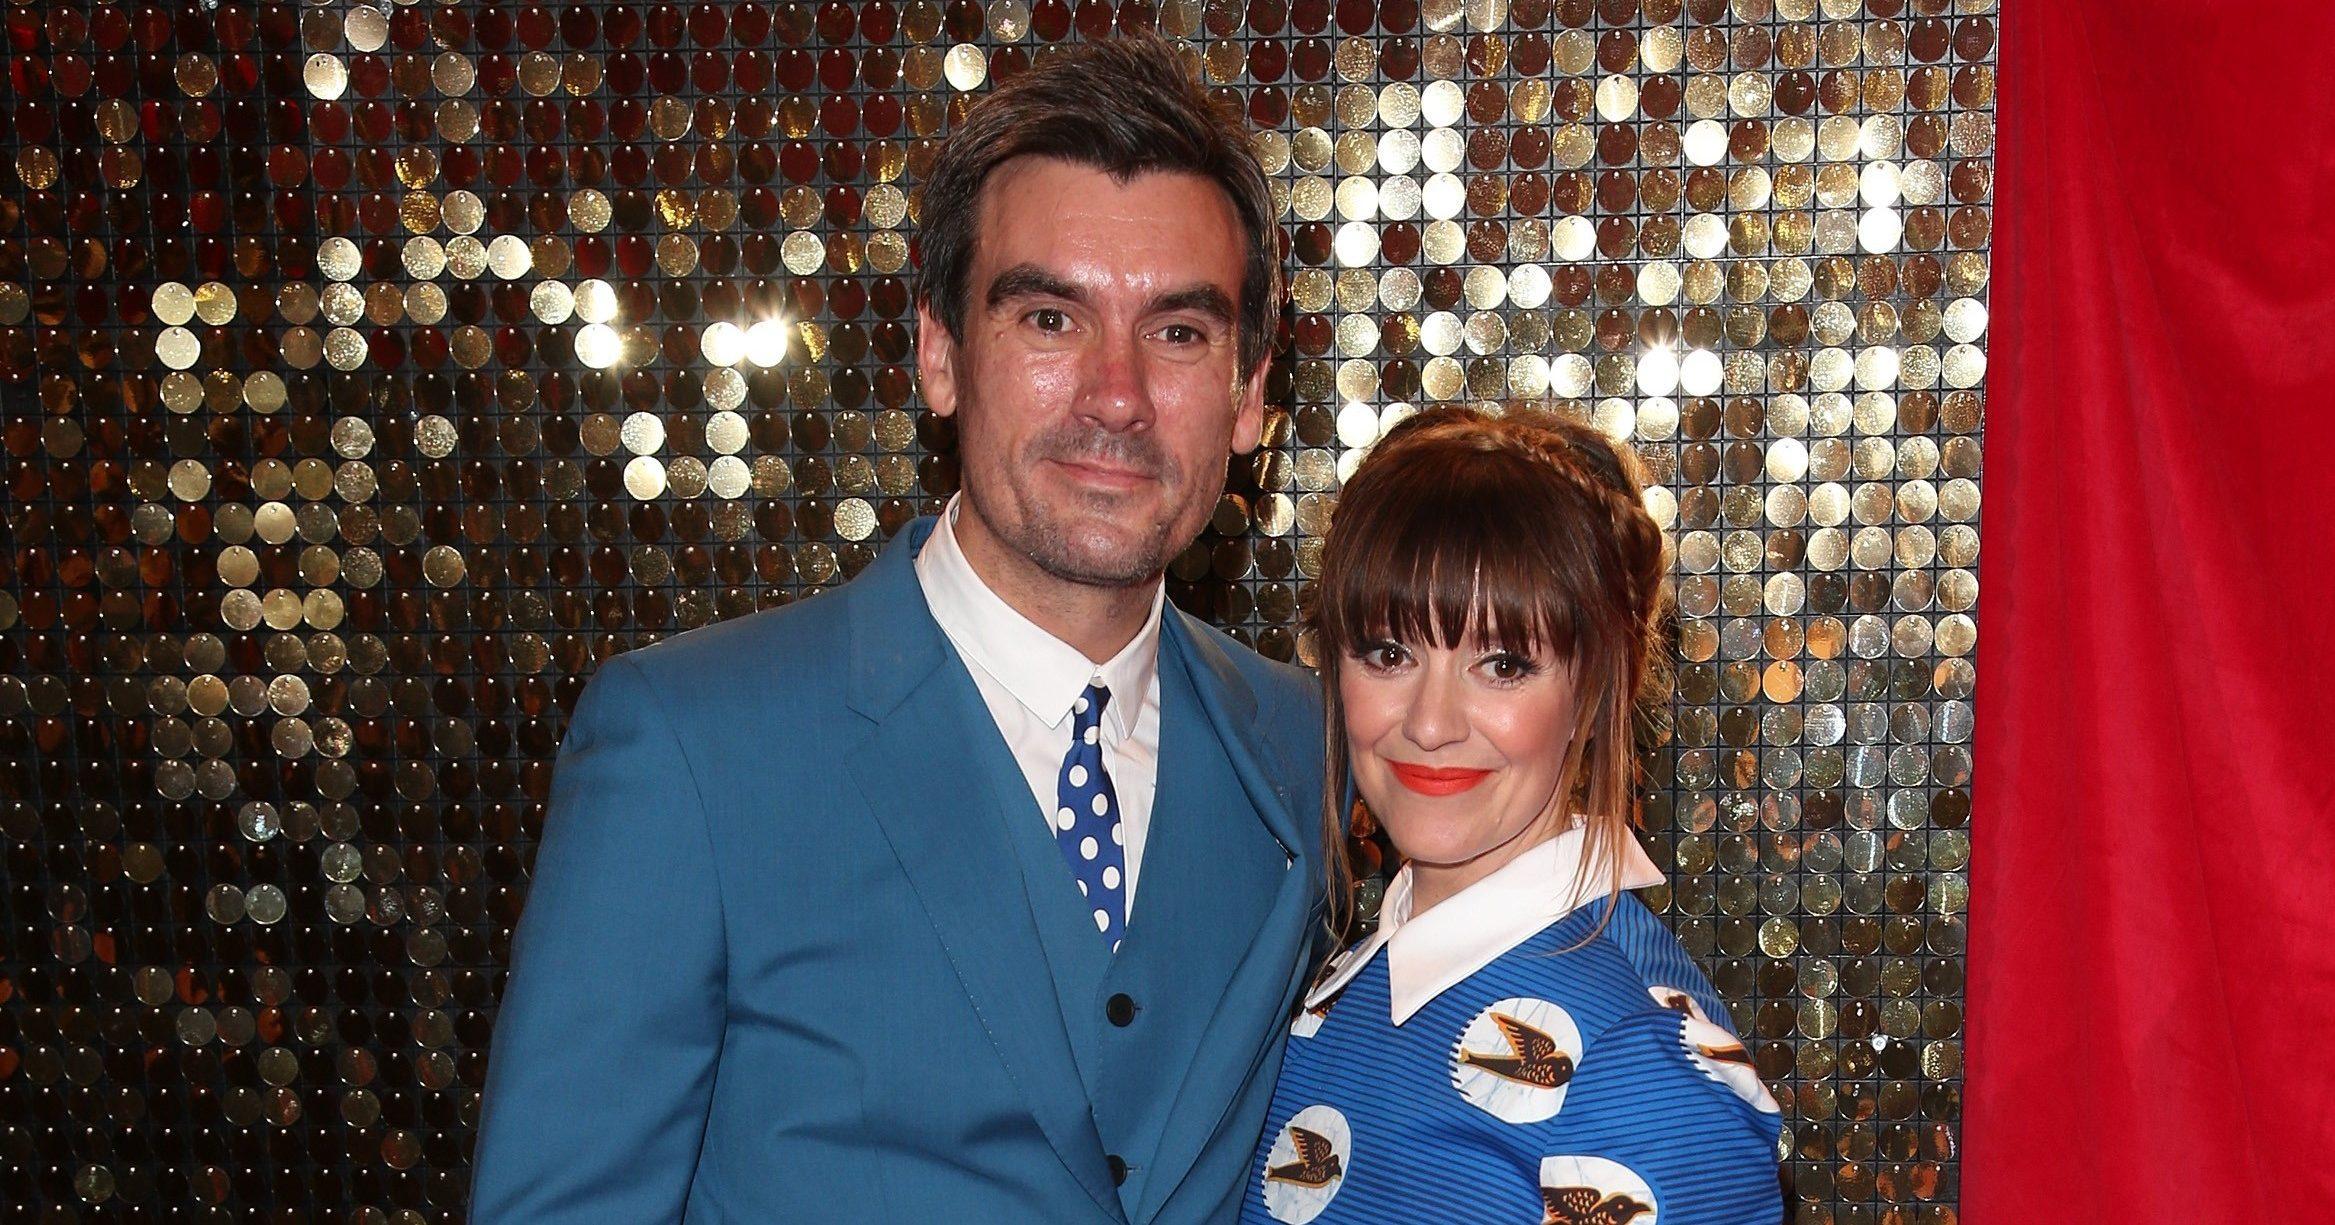 Emmerdale star Zoe Henry reveals nerves filming 'horrendous' scene with husband Jeff Hordley